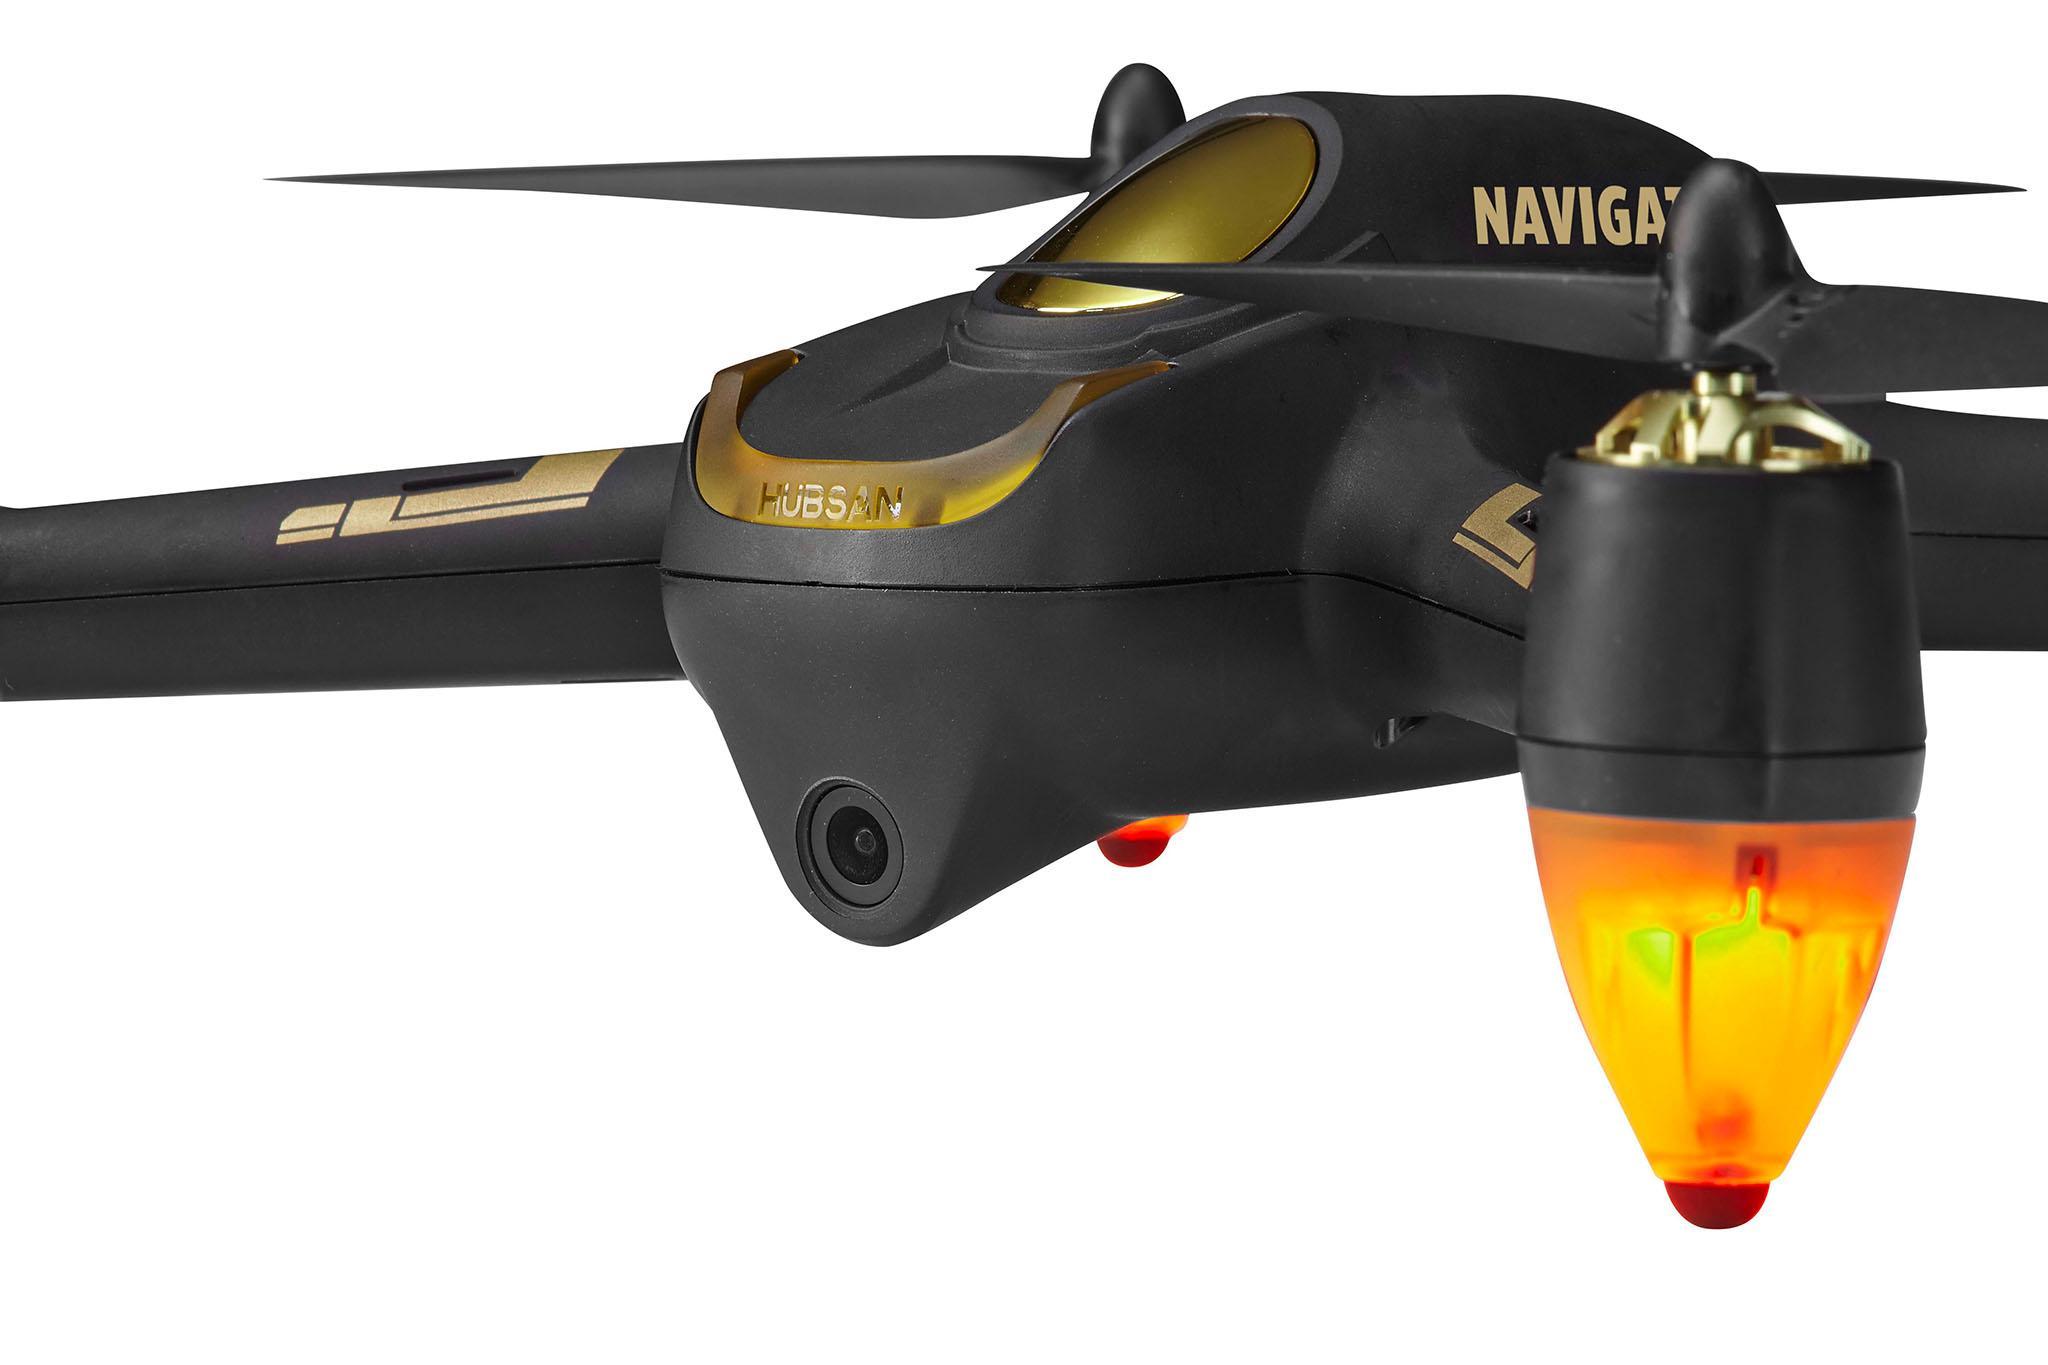 revell control rc gps quadrocopter mit fpv full hd kamera. Black Bedroom Furniture Sets. Home Design Ideas